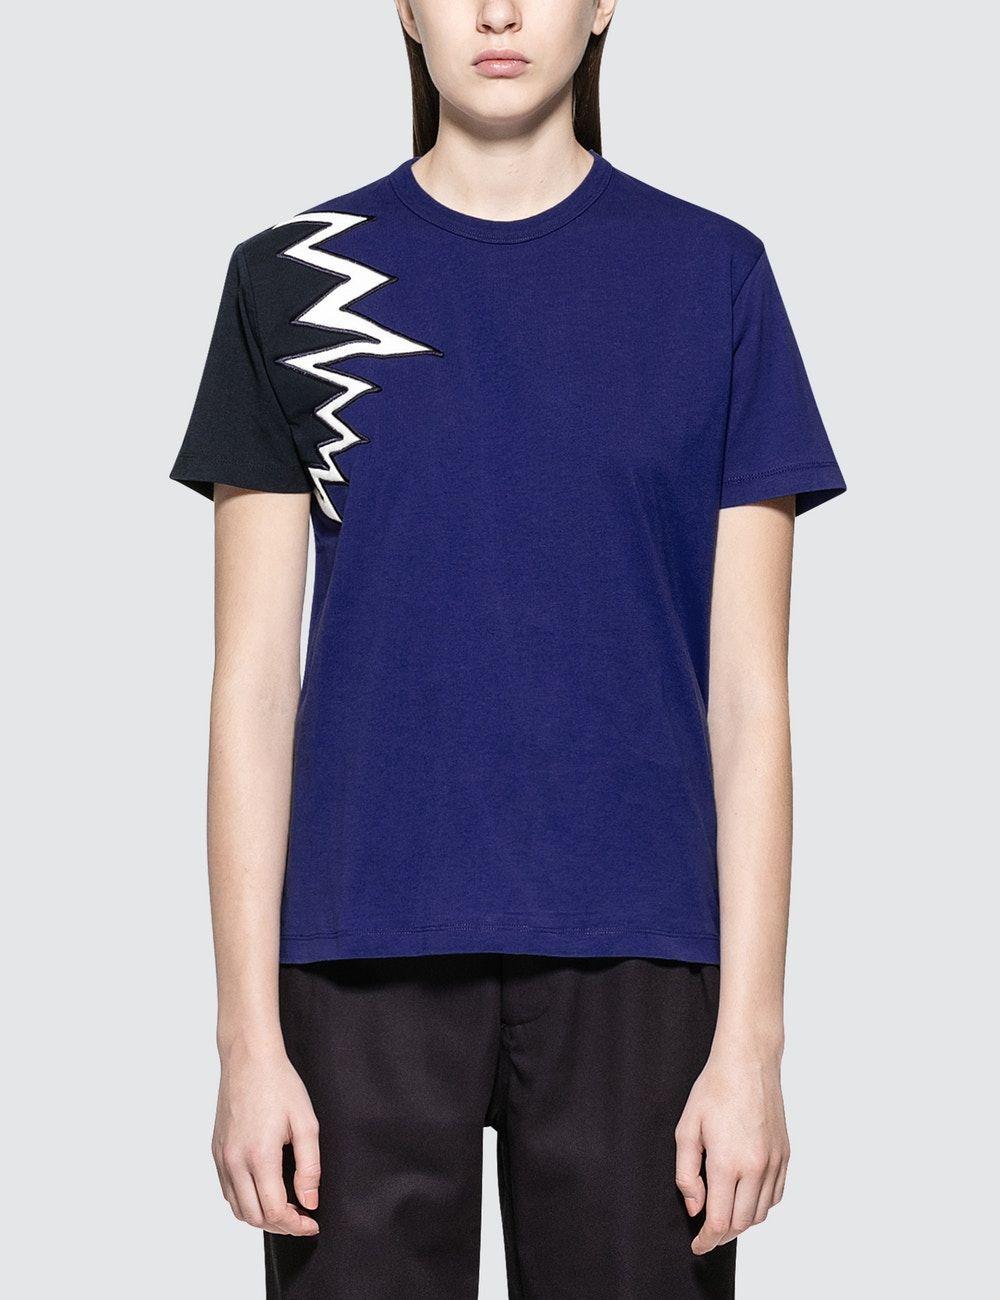 Maison Kitsune Embroidery S/S T-Shirt